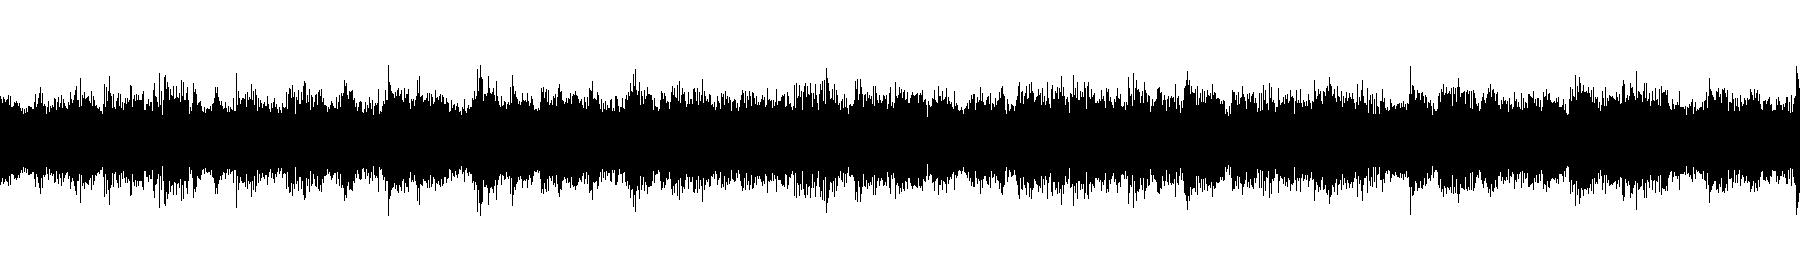 92 g densepad sp 01